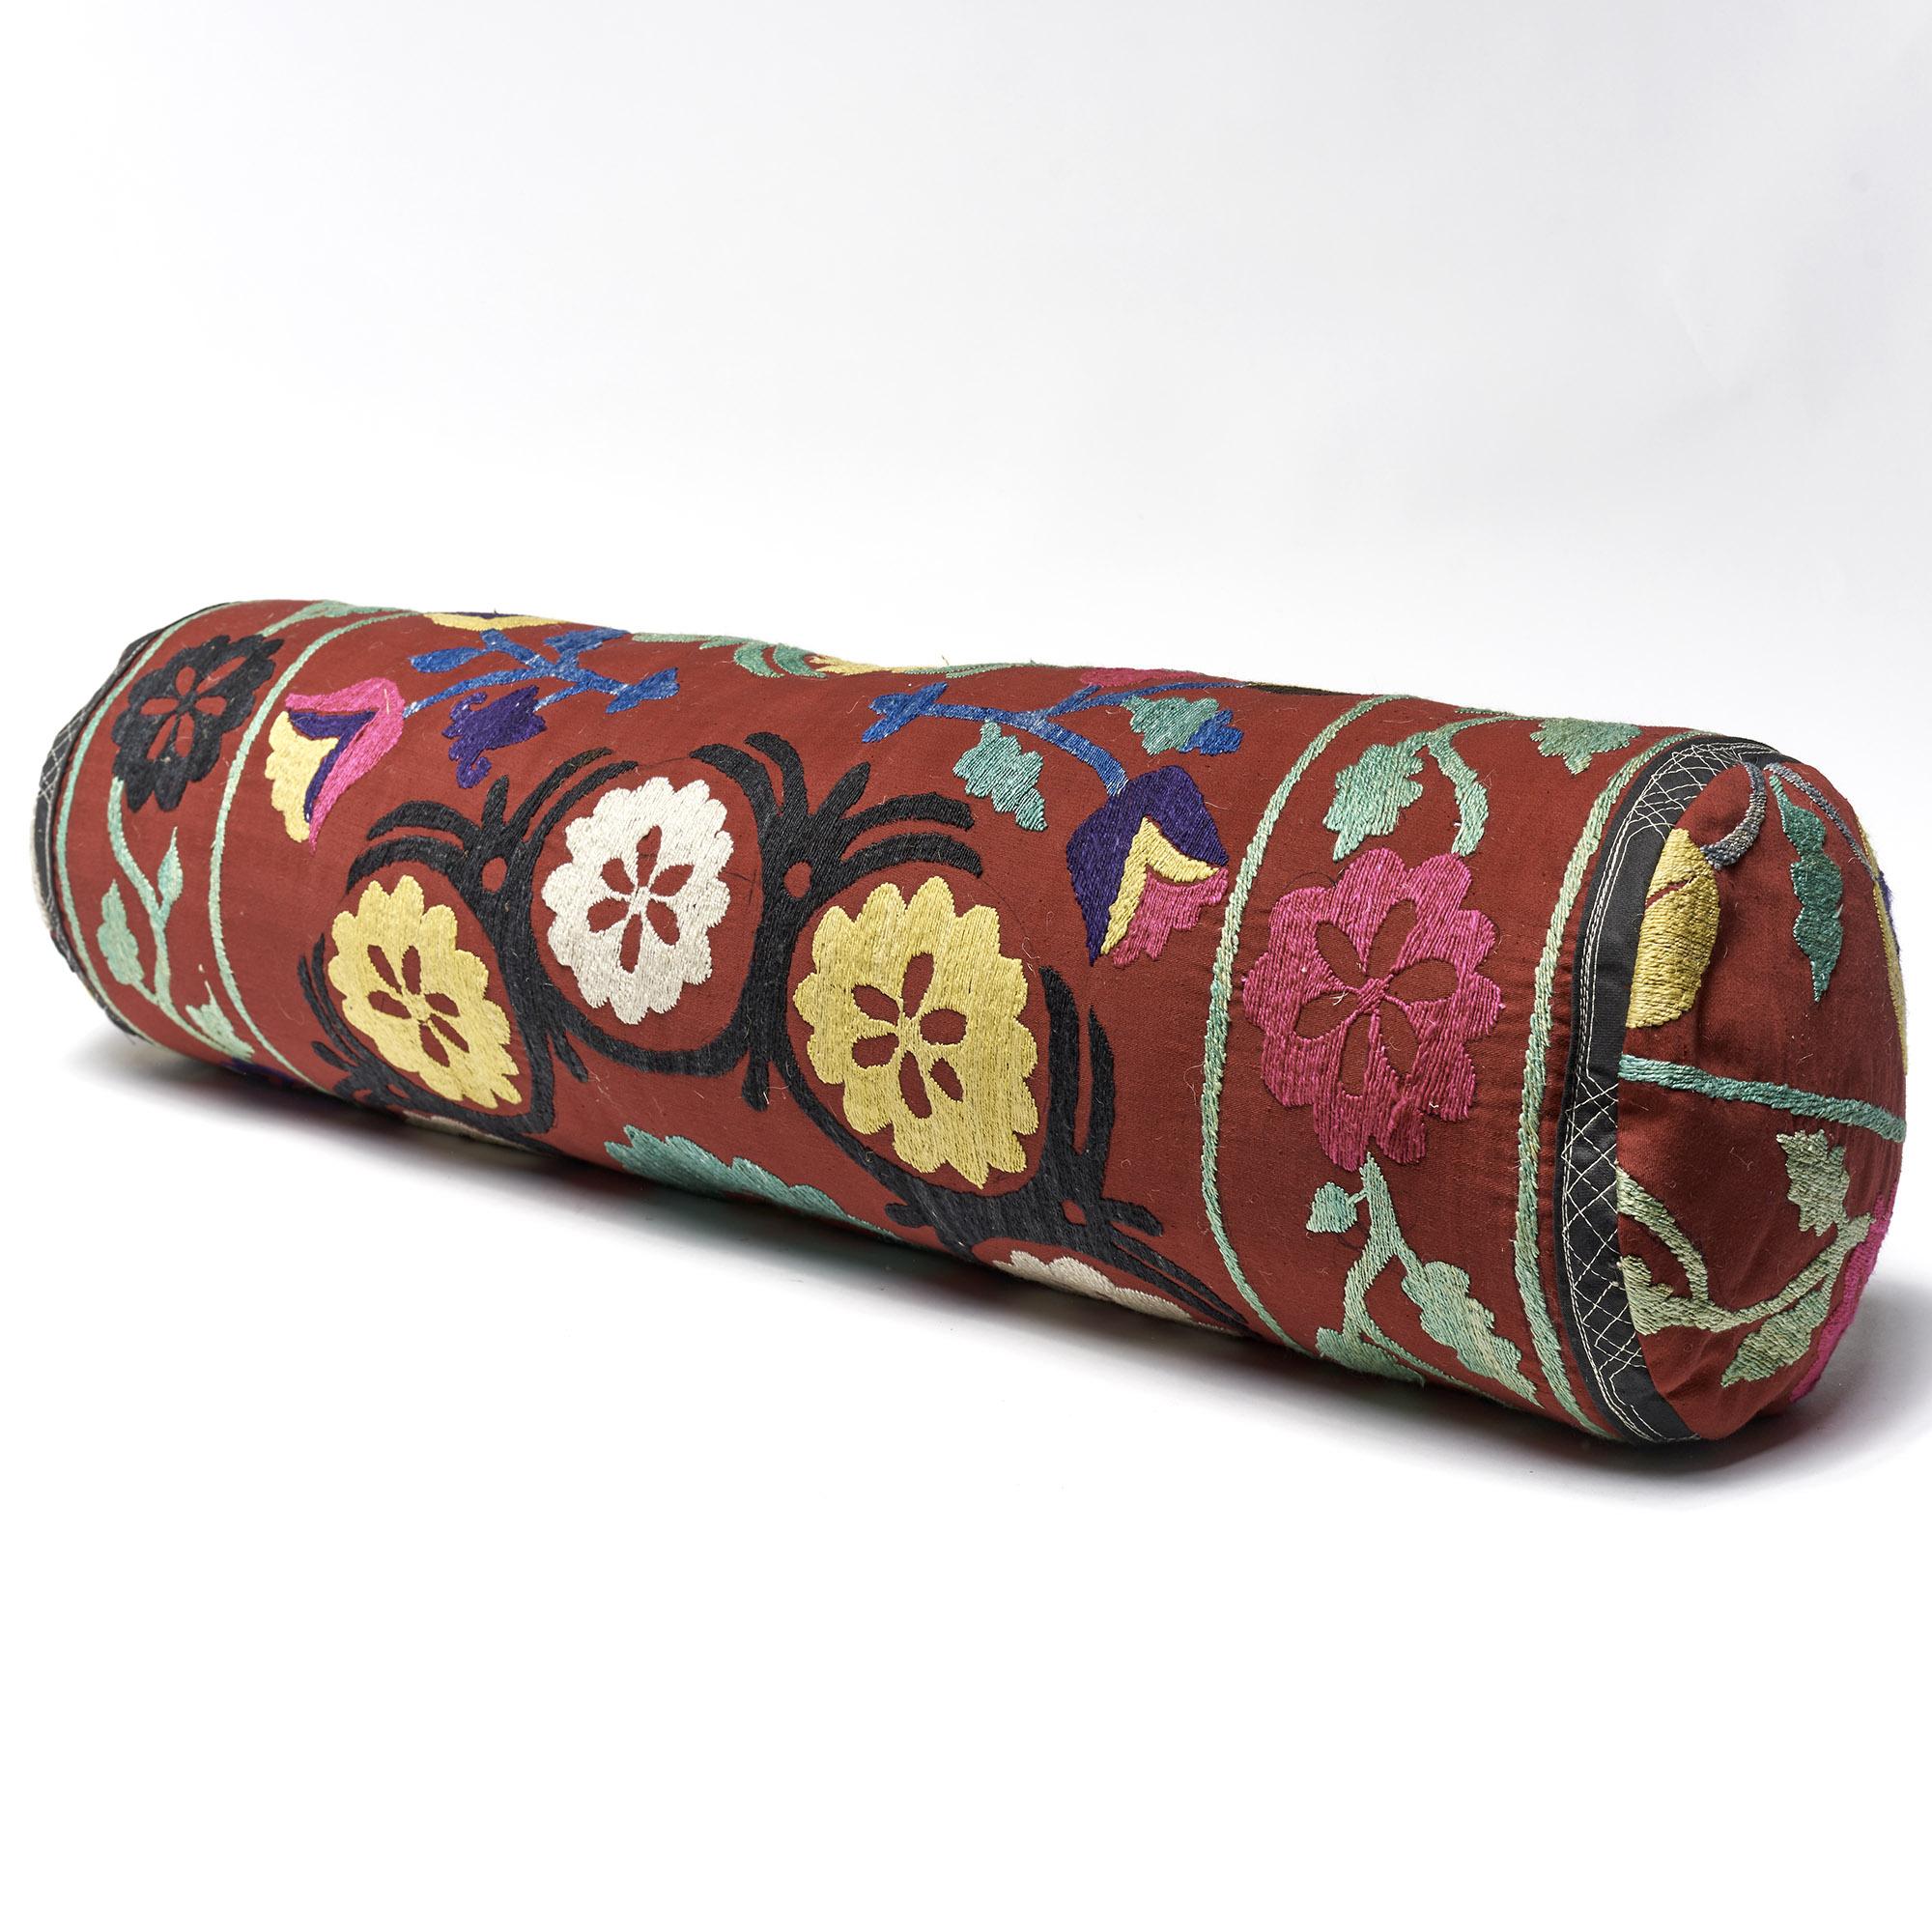 Almohadón rollo Suzani bordado a mano, bordeaux con flores de varios colores